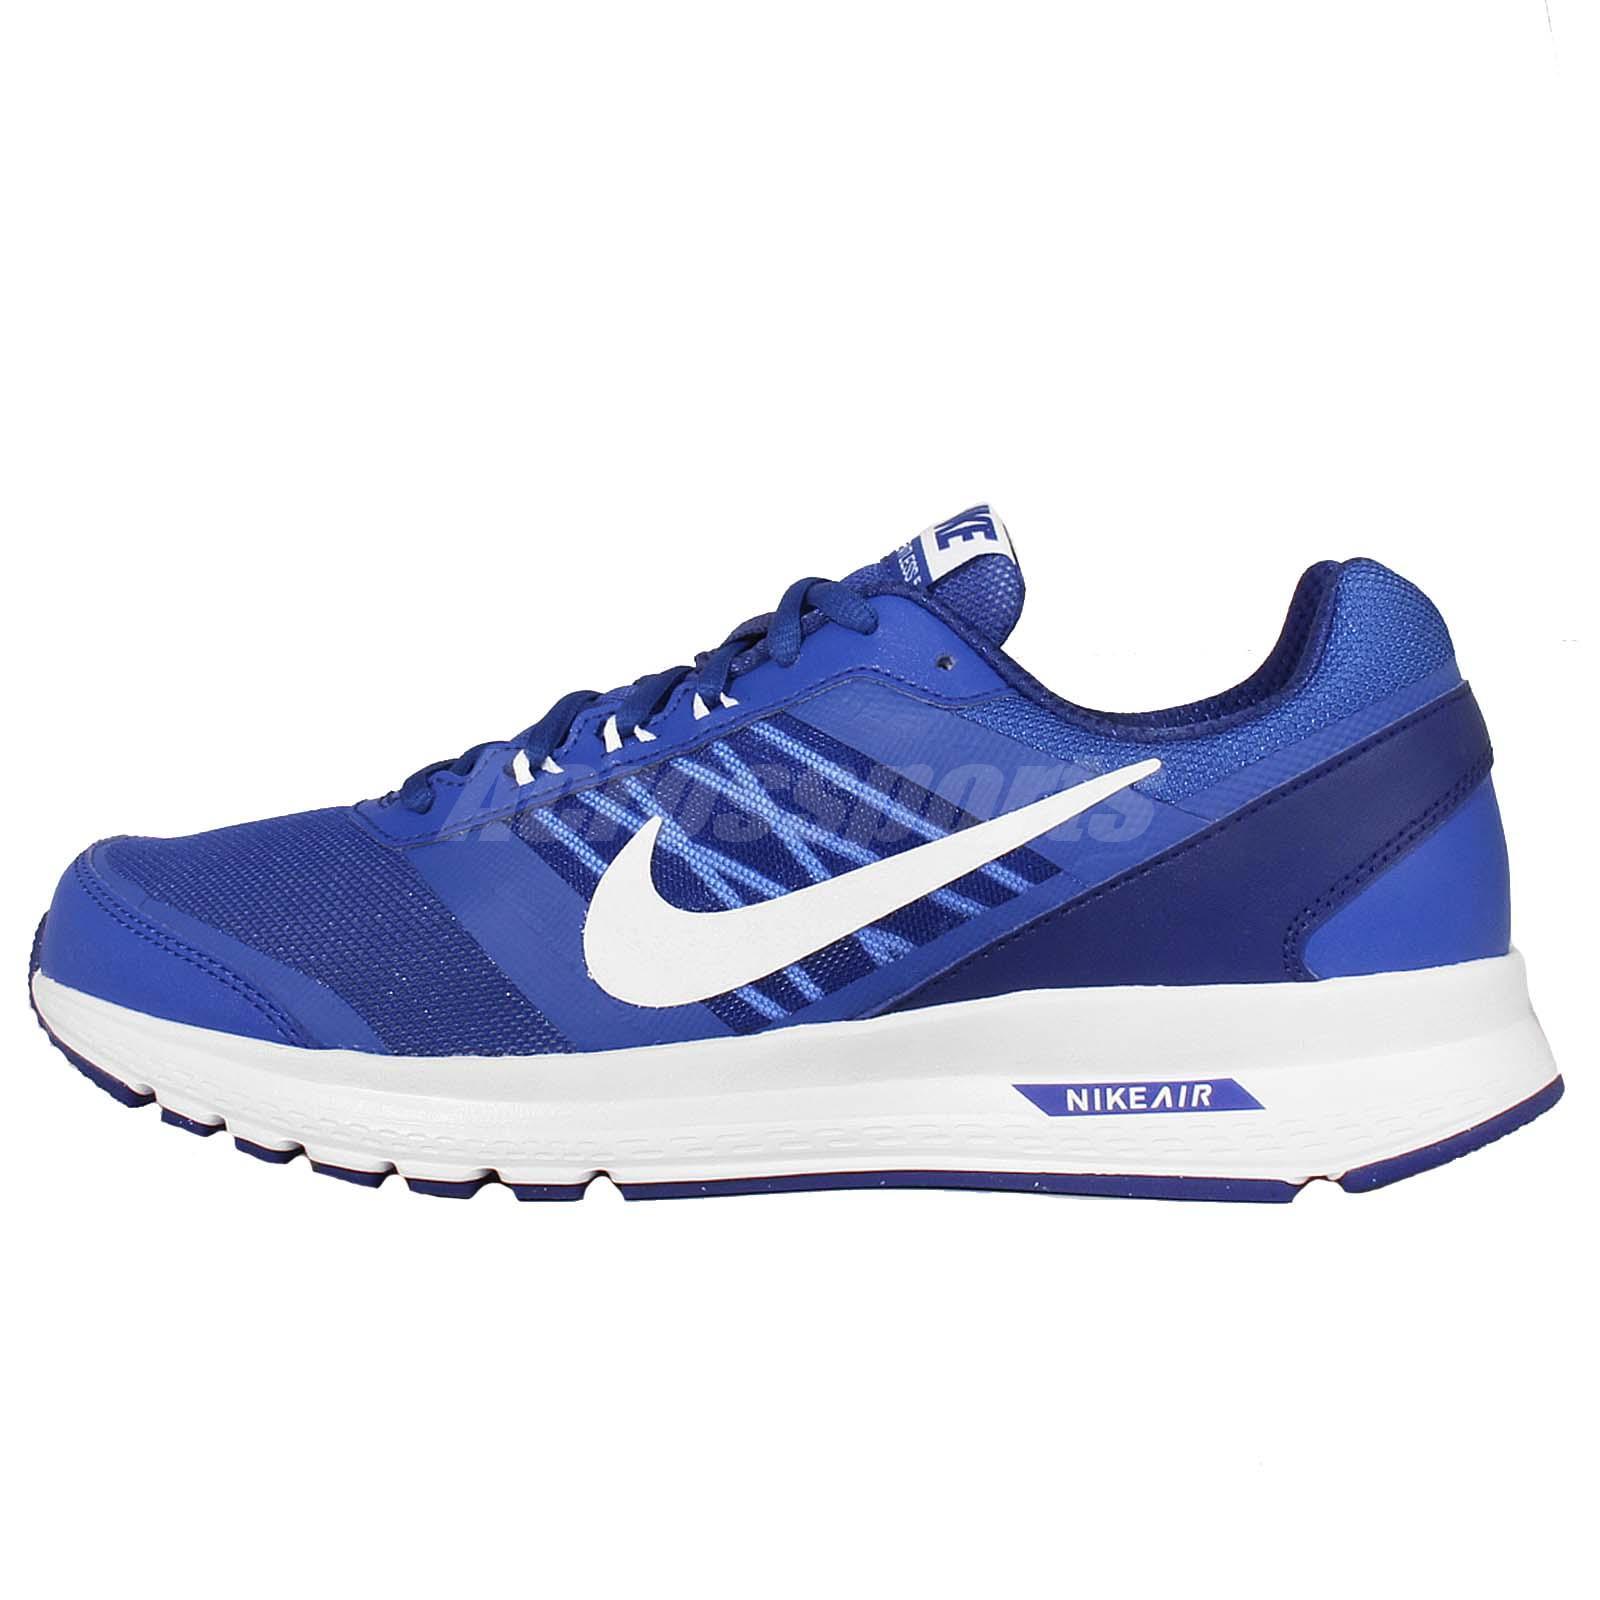 Nike Air Relentless Mens Running Shoes - Musée des impressionnismes ... 30d96293db49b